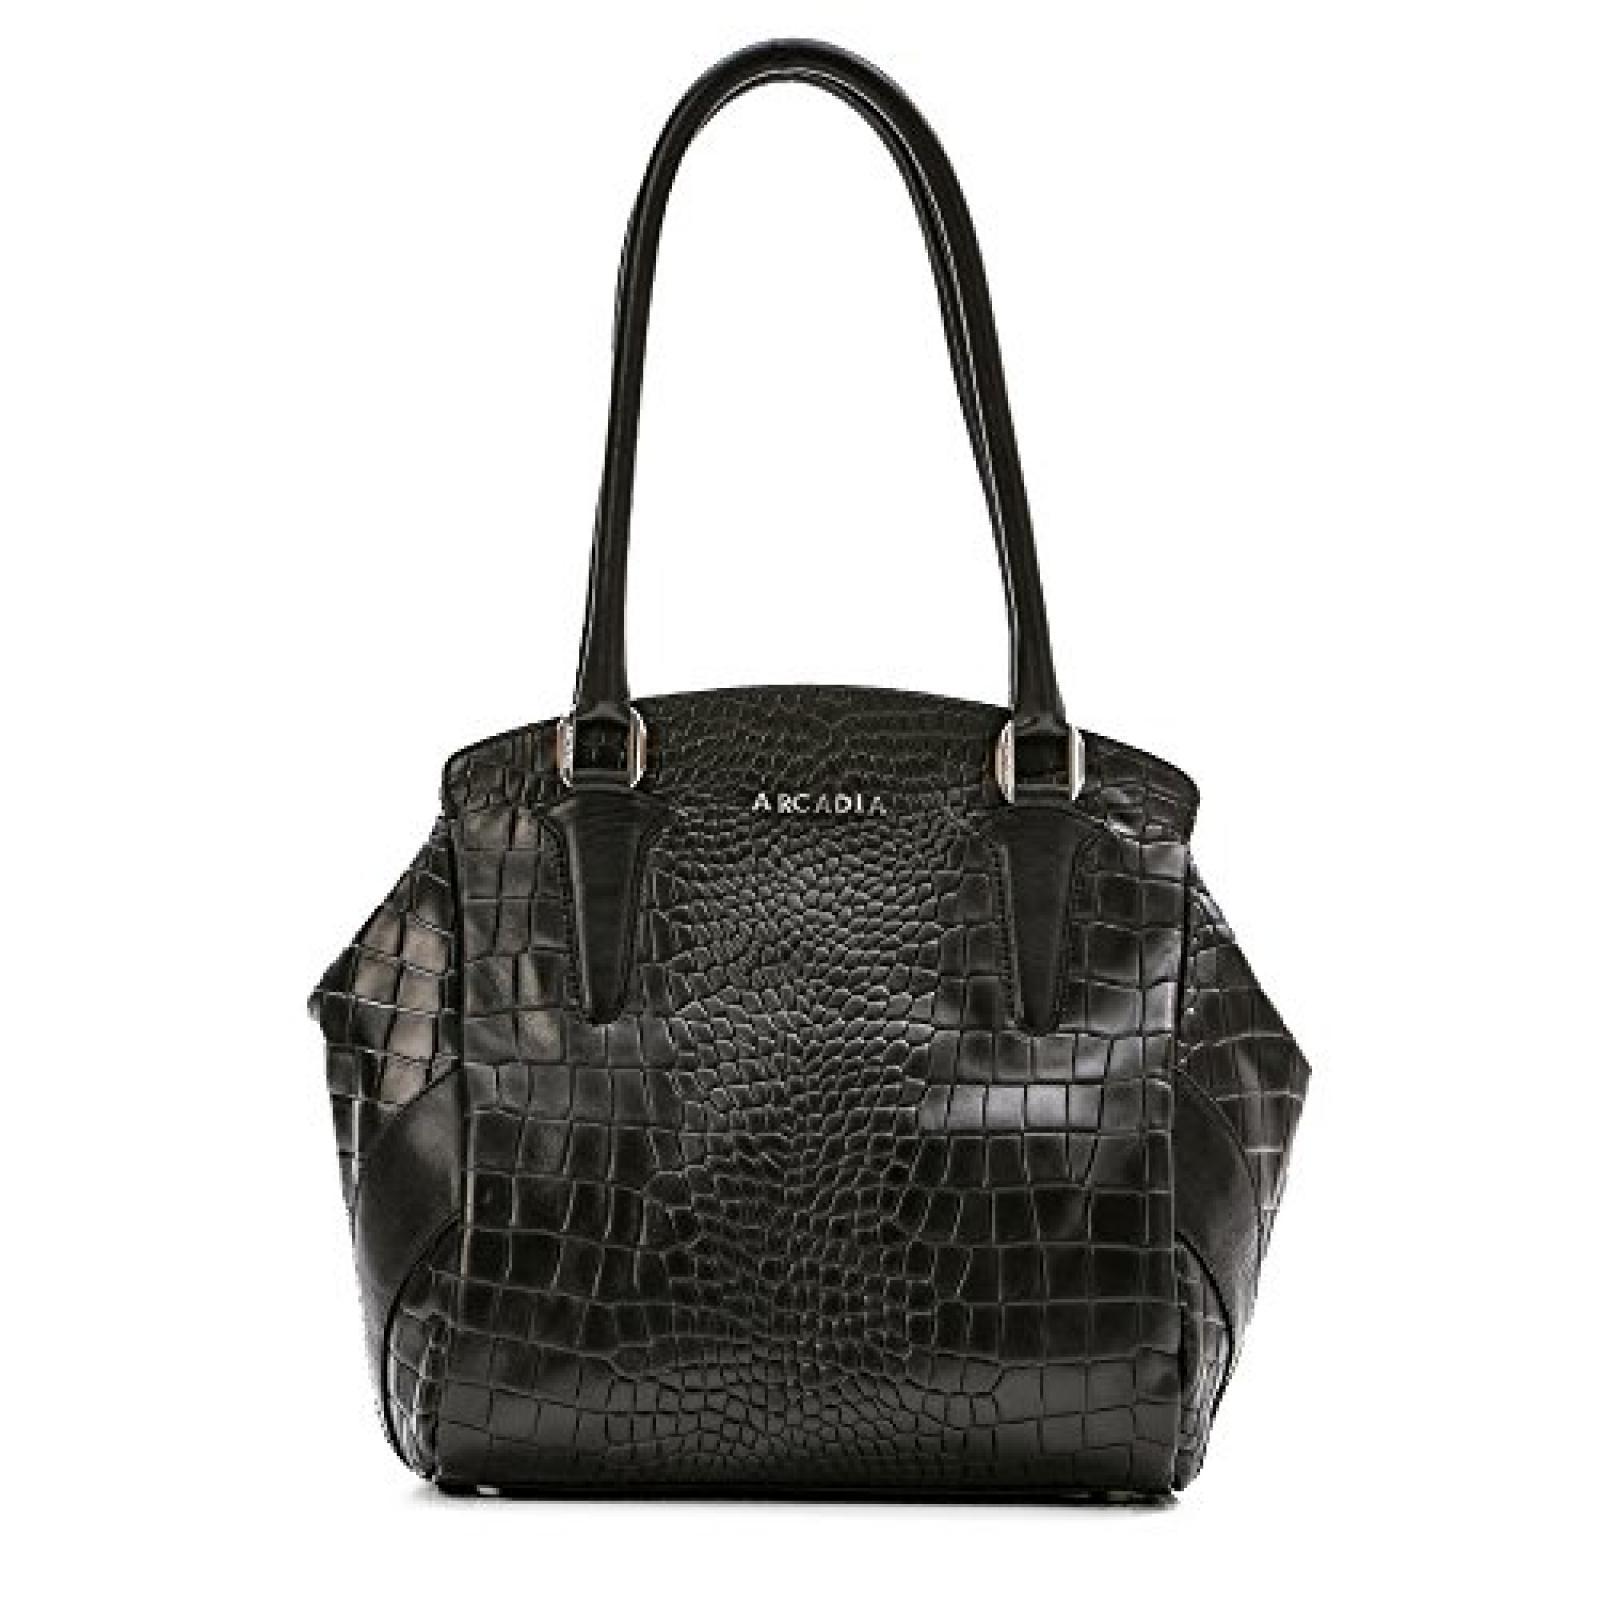 Arcadia Lesina großen gedruckt Krokoleder Tote-Schulterhandtasche - schwarz